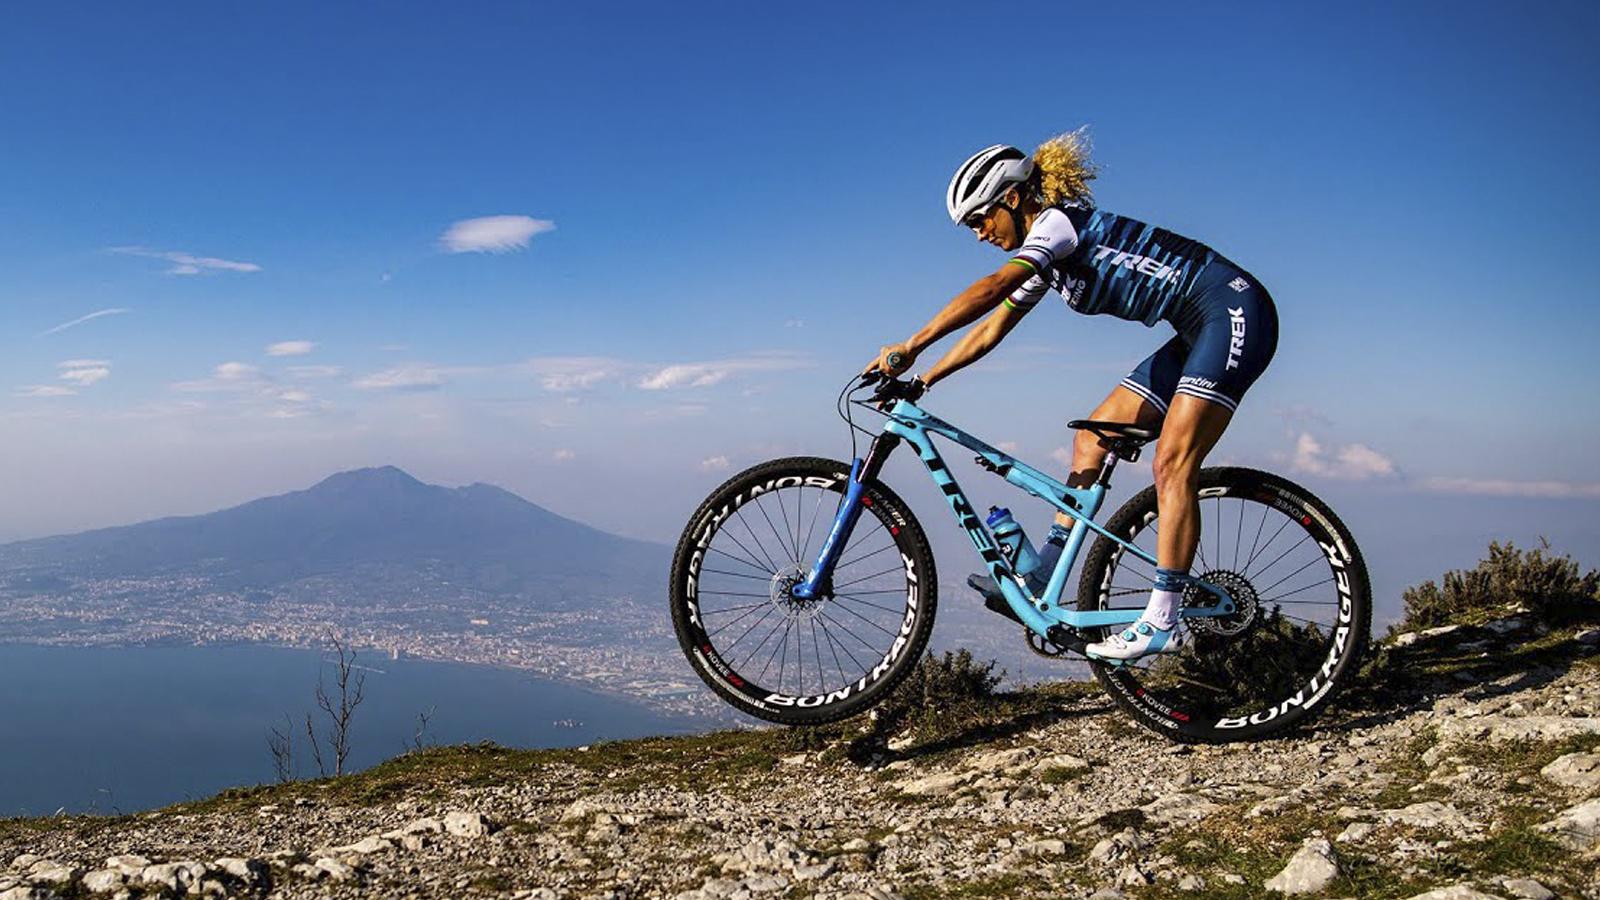 Mountain Bike - Buying Advice cover image